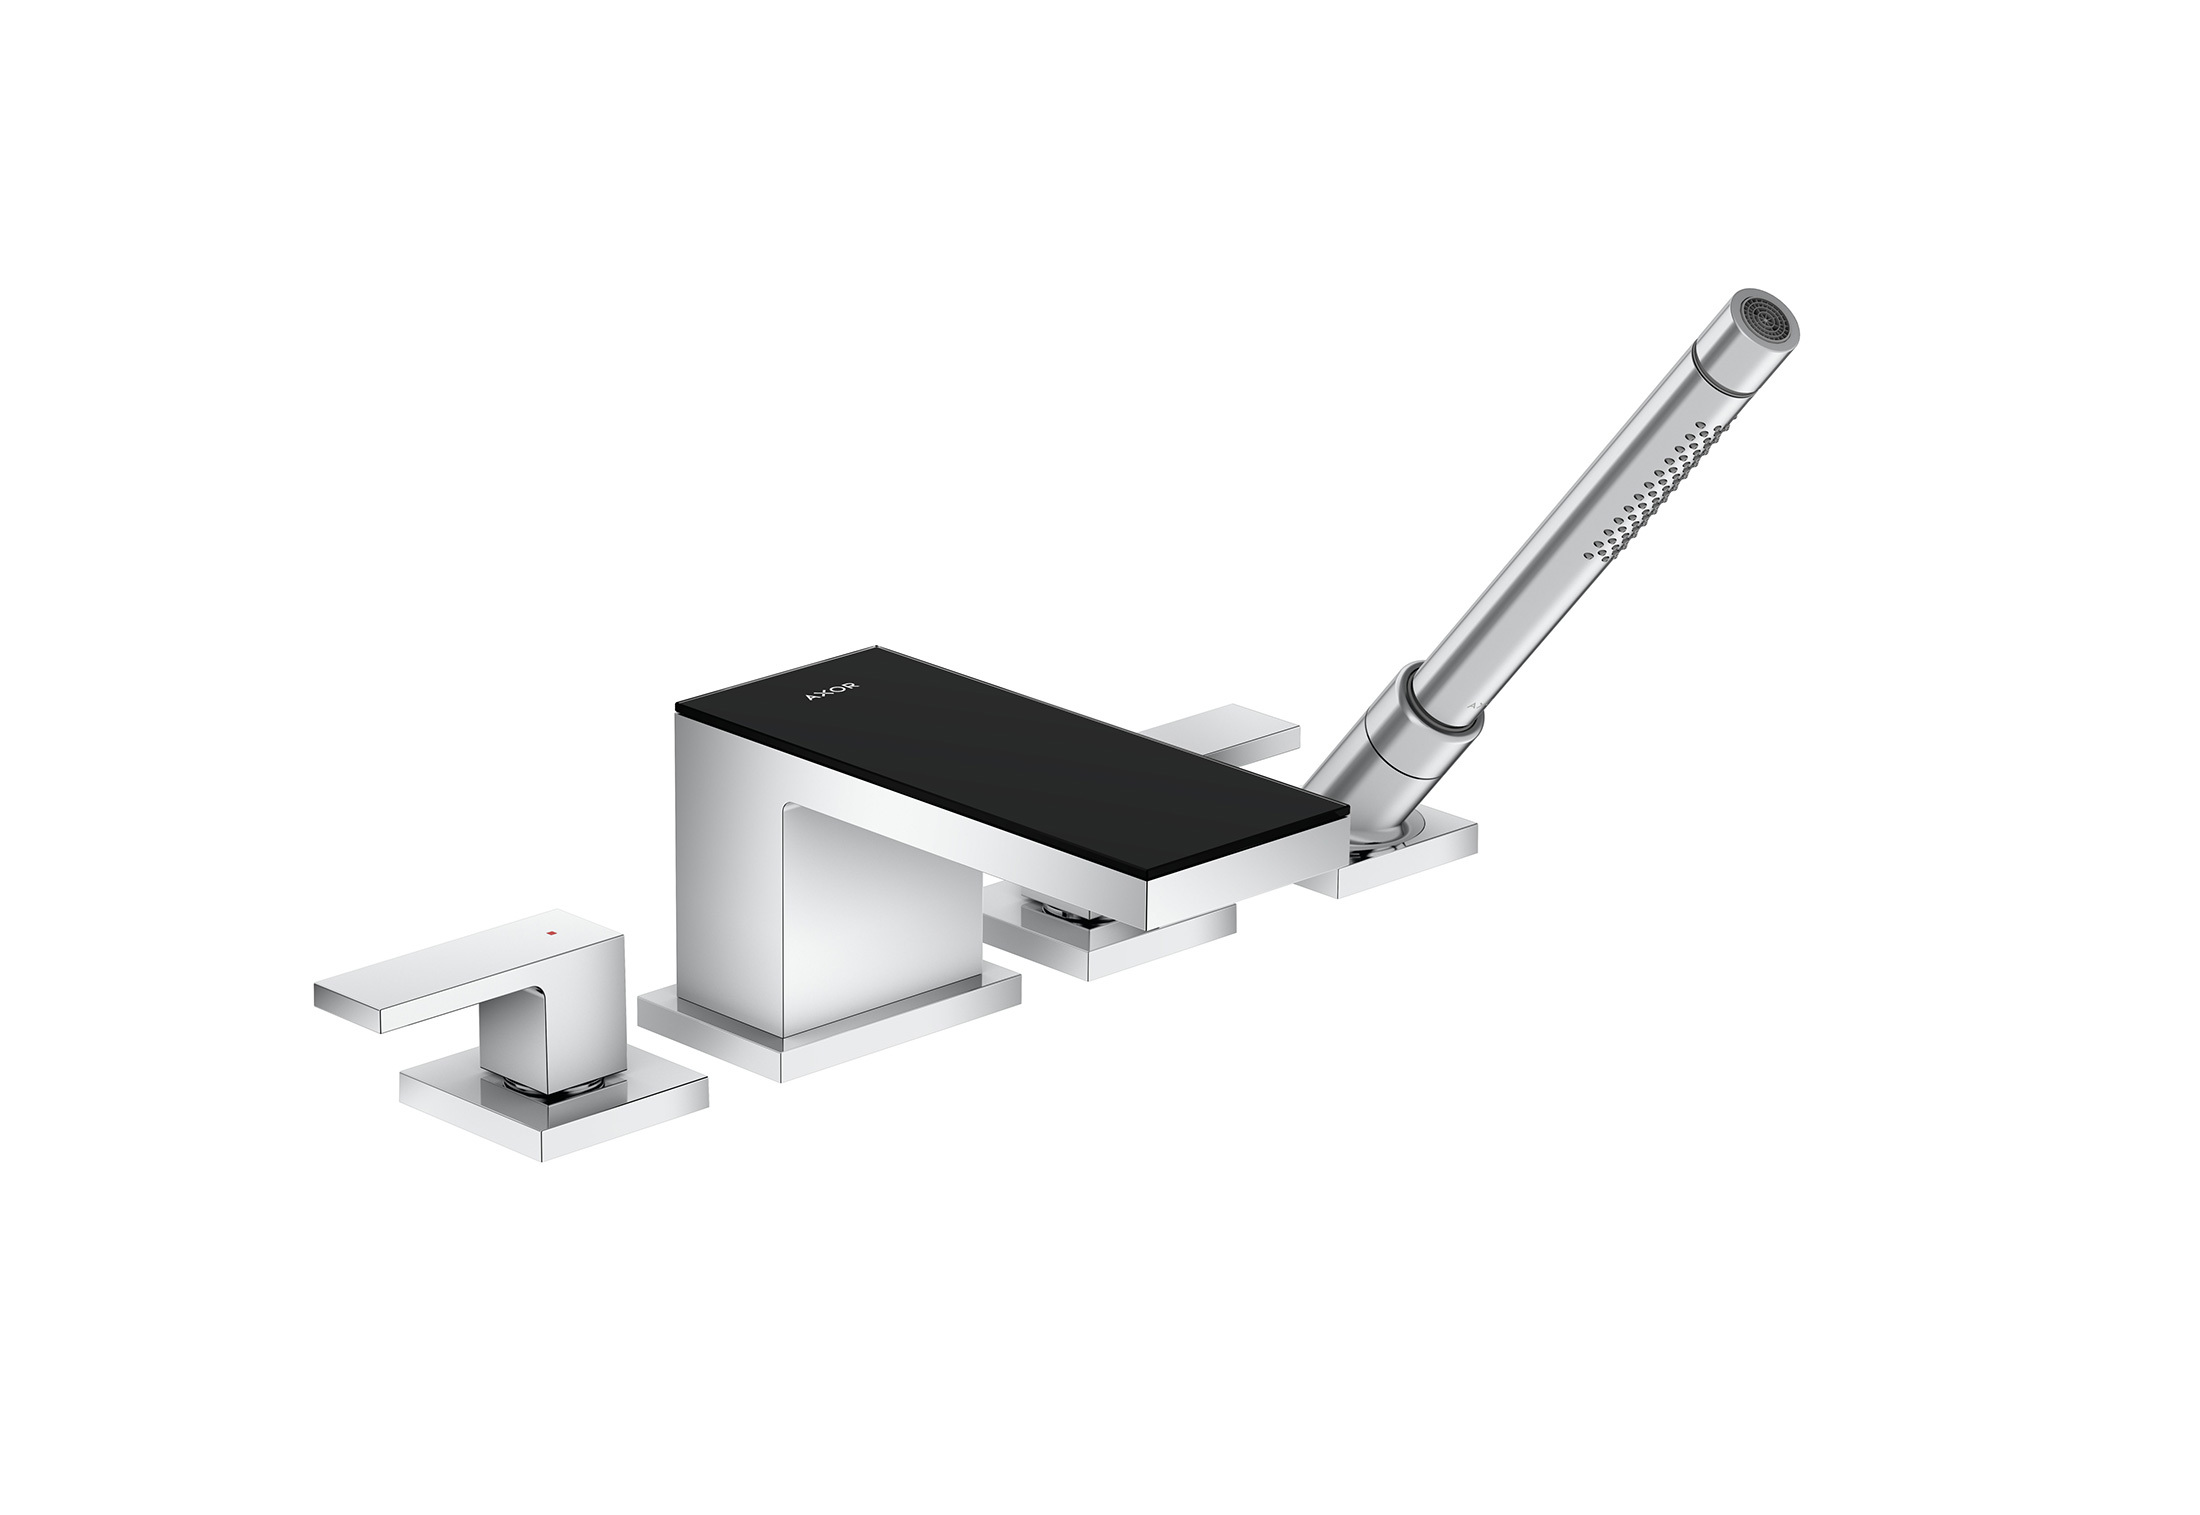 Axor MyEdition 4-hole Rim Mounted Bath Mixer By Axor